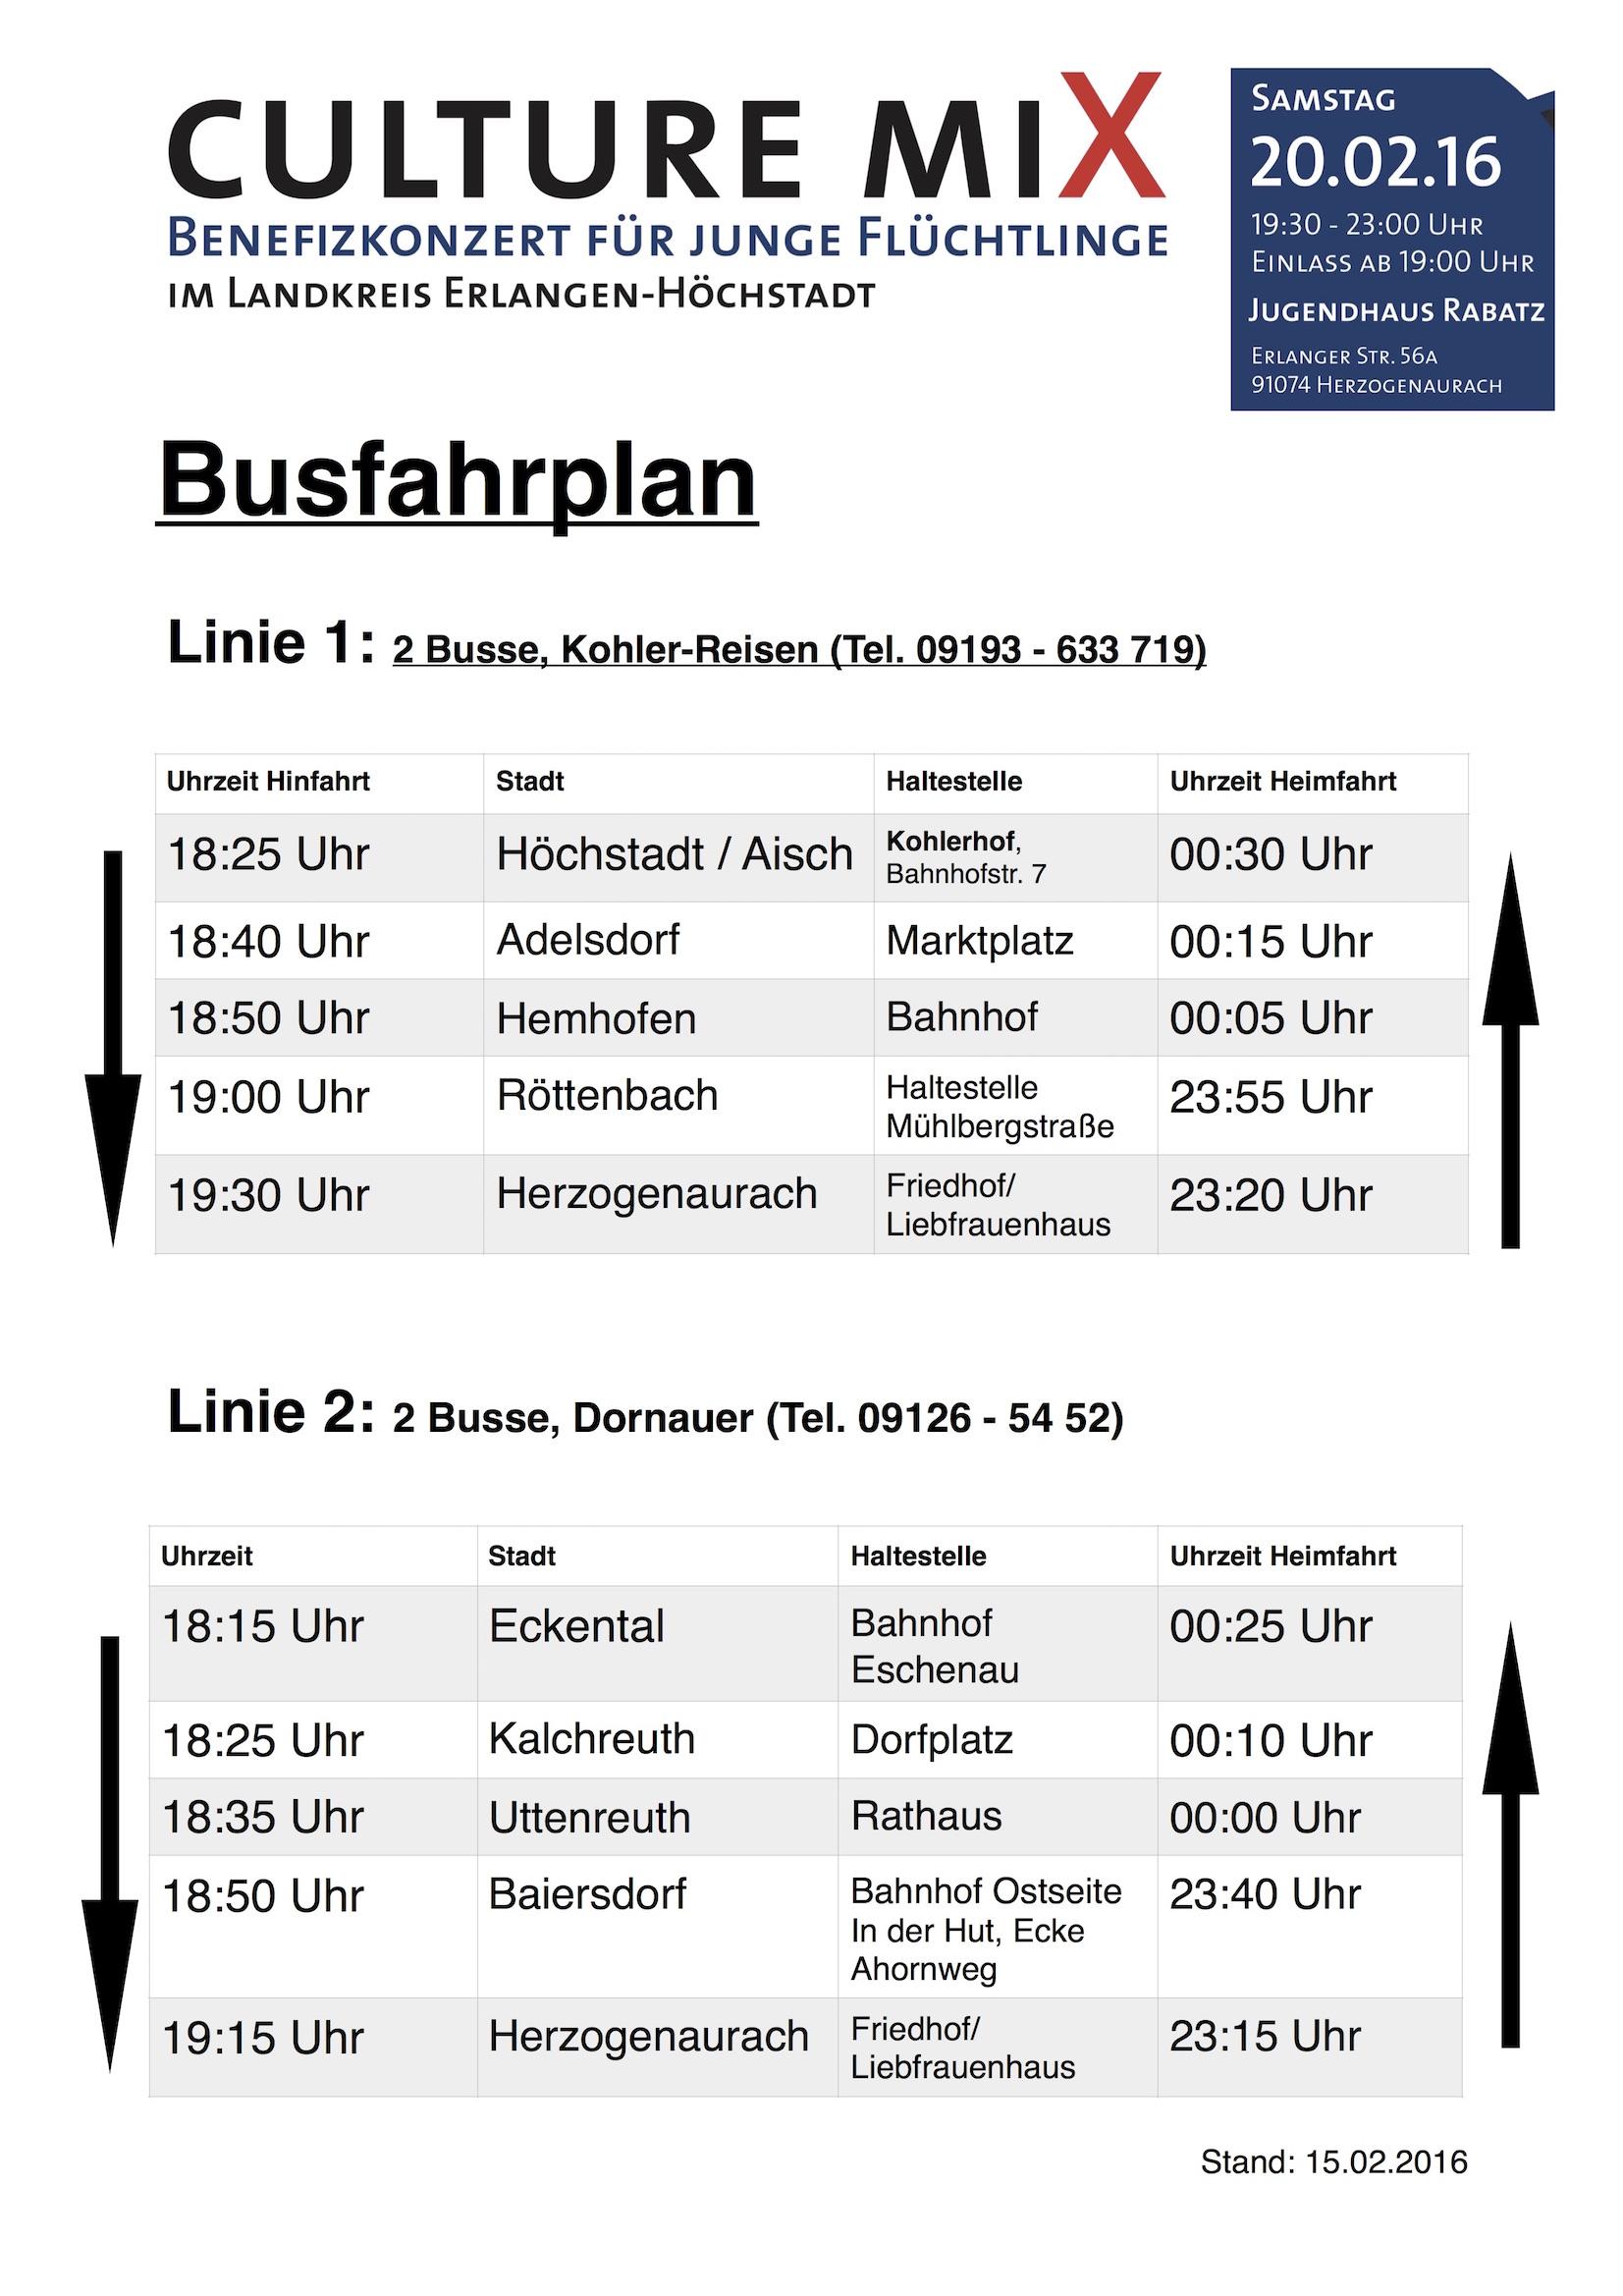 Busfahrplan Culture Mix